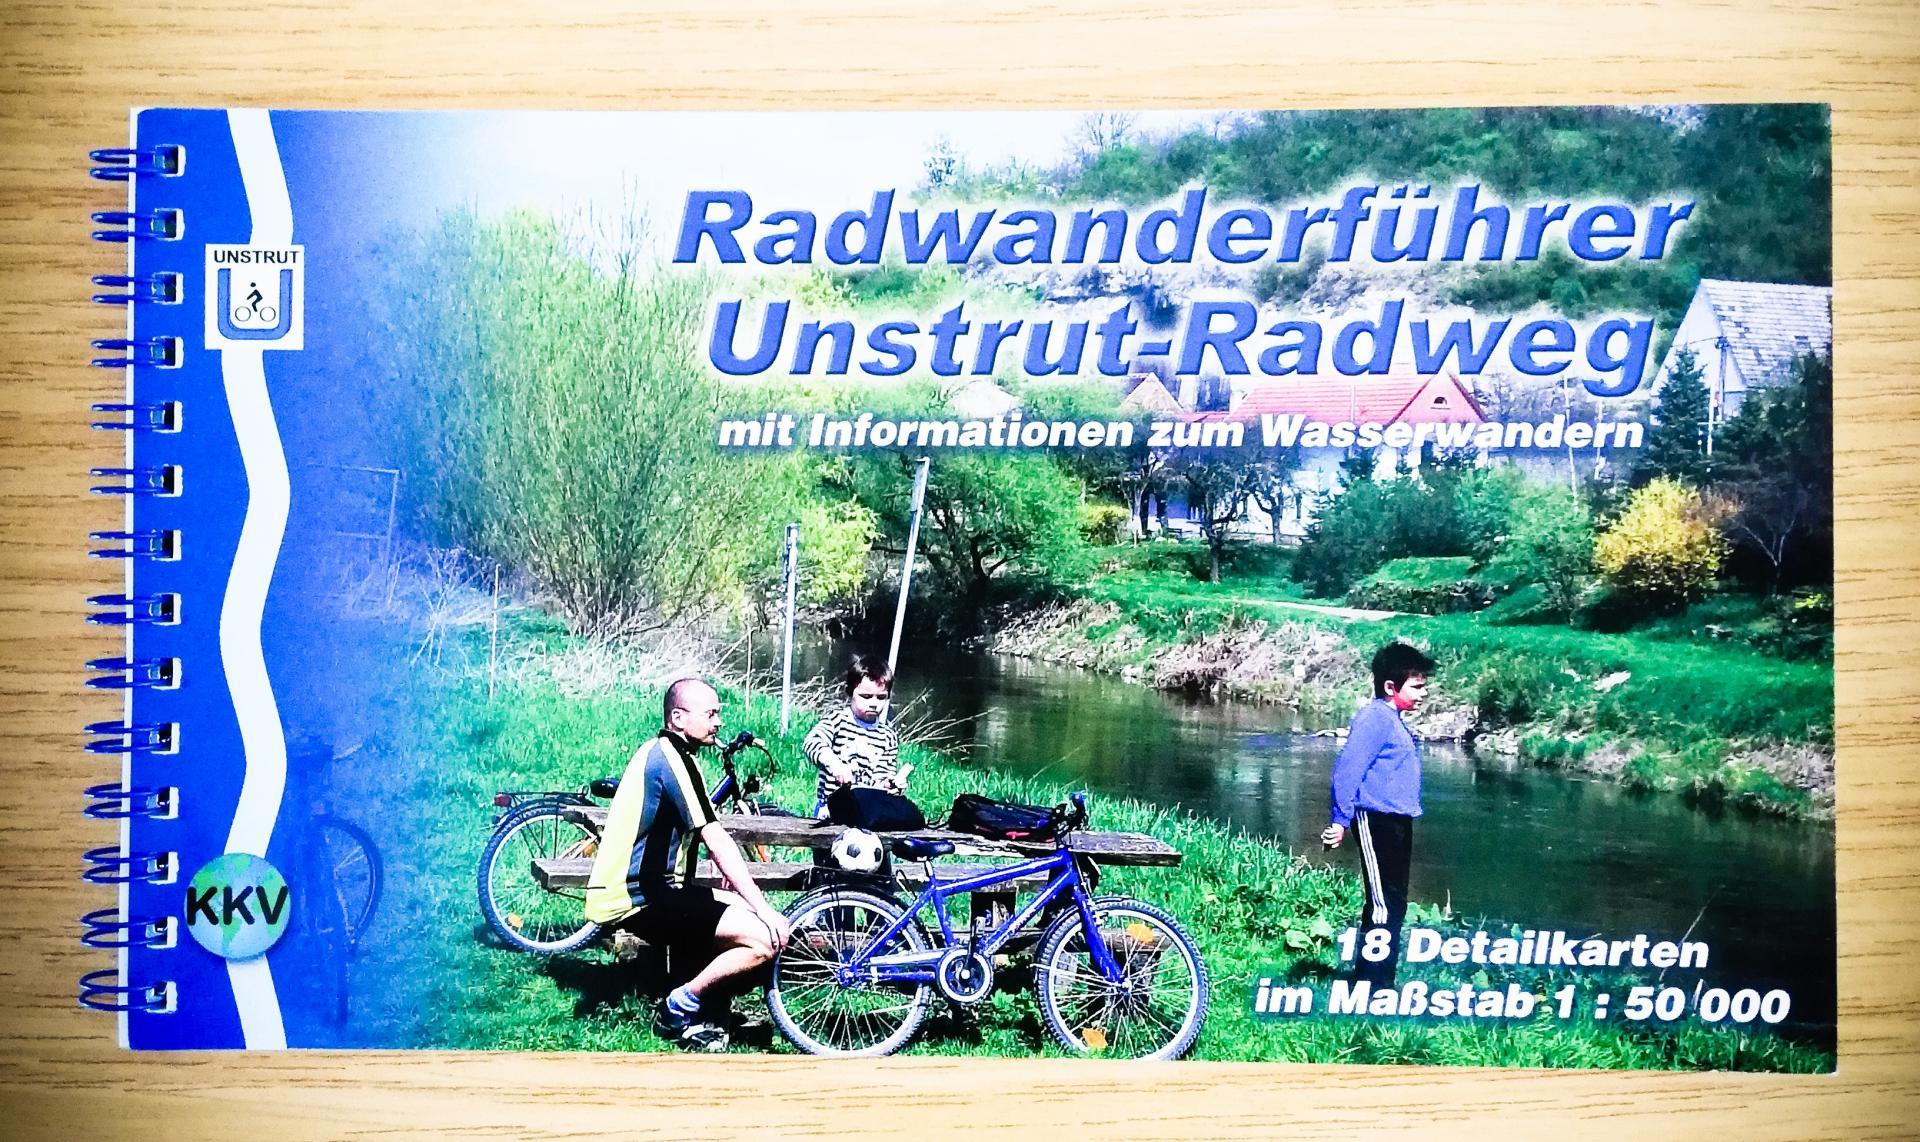 Radwanderführer Unstrut-Radweg